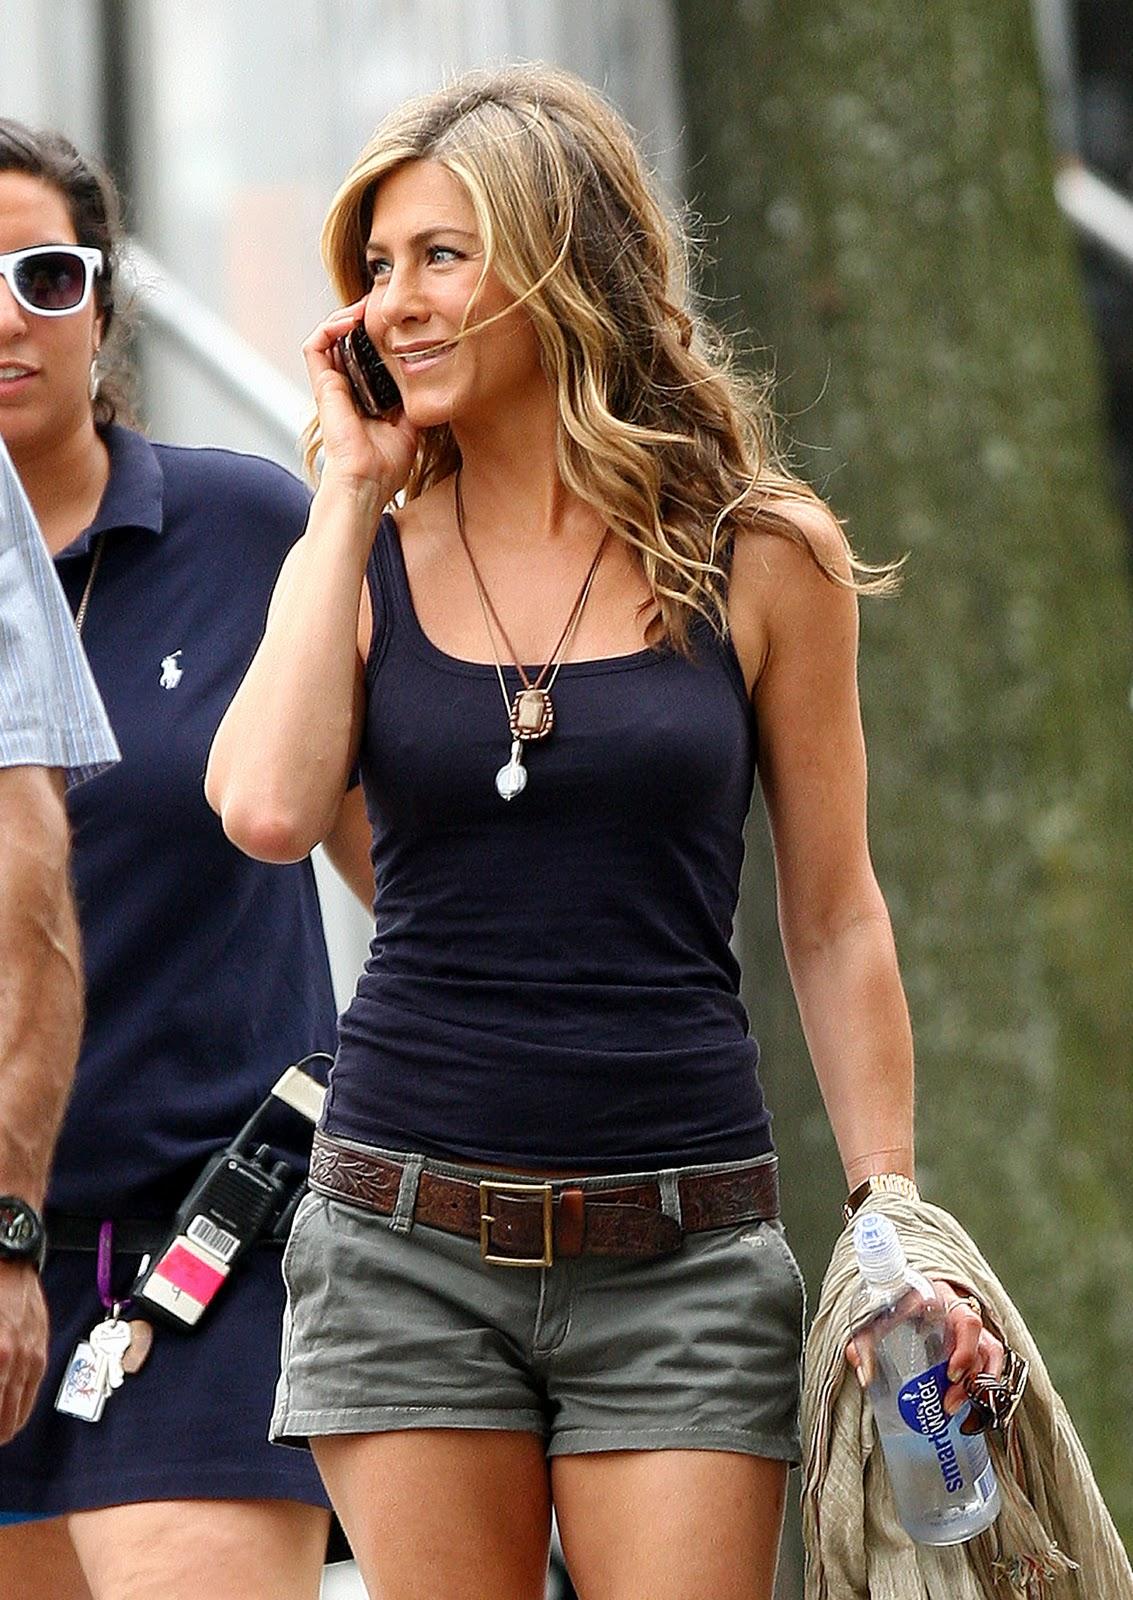 http://1.bp.blogspot.com/-ez6iq5W68Z4/Trly51W83KI/AAAAAAAAAJk/j9EDVMeBBiw/s1600/jennifer-aniston-green-shorts.jpg